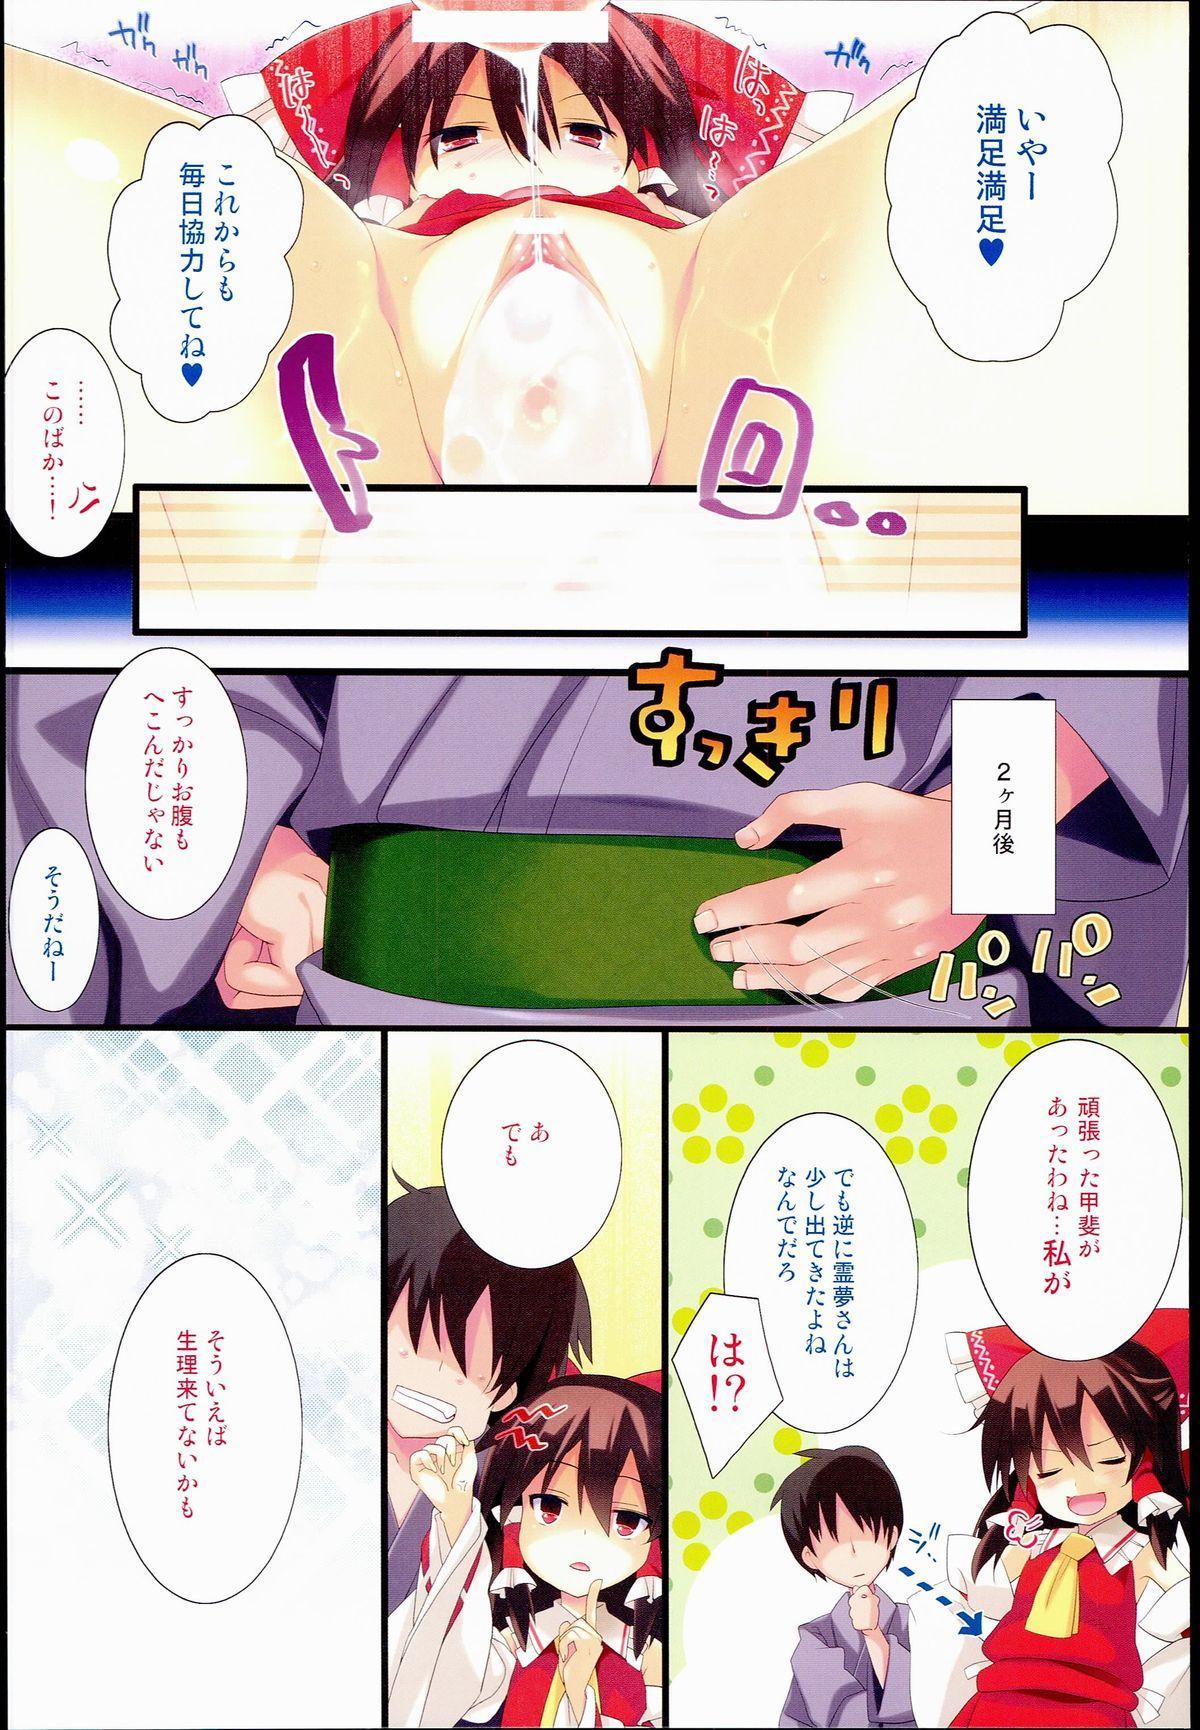 Reimu-san to SEX de Yaseyou! 9